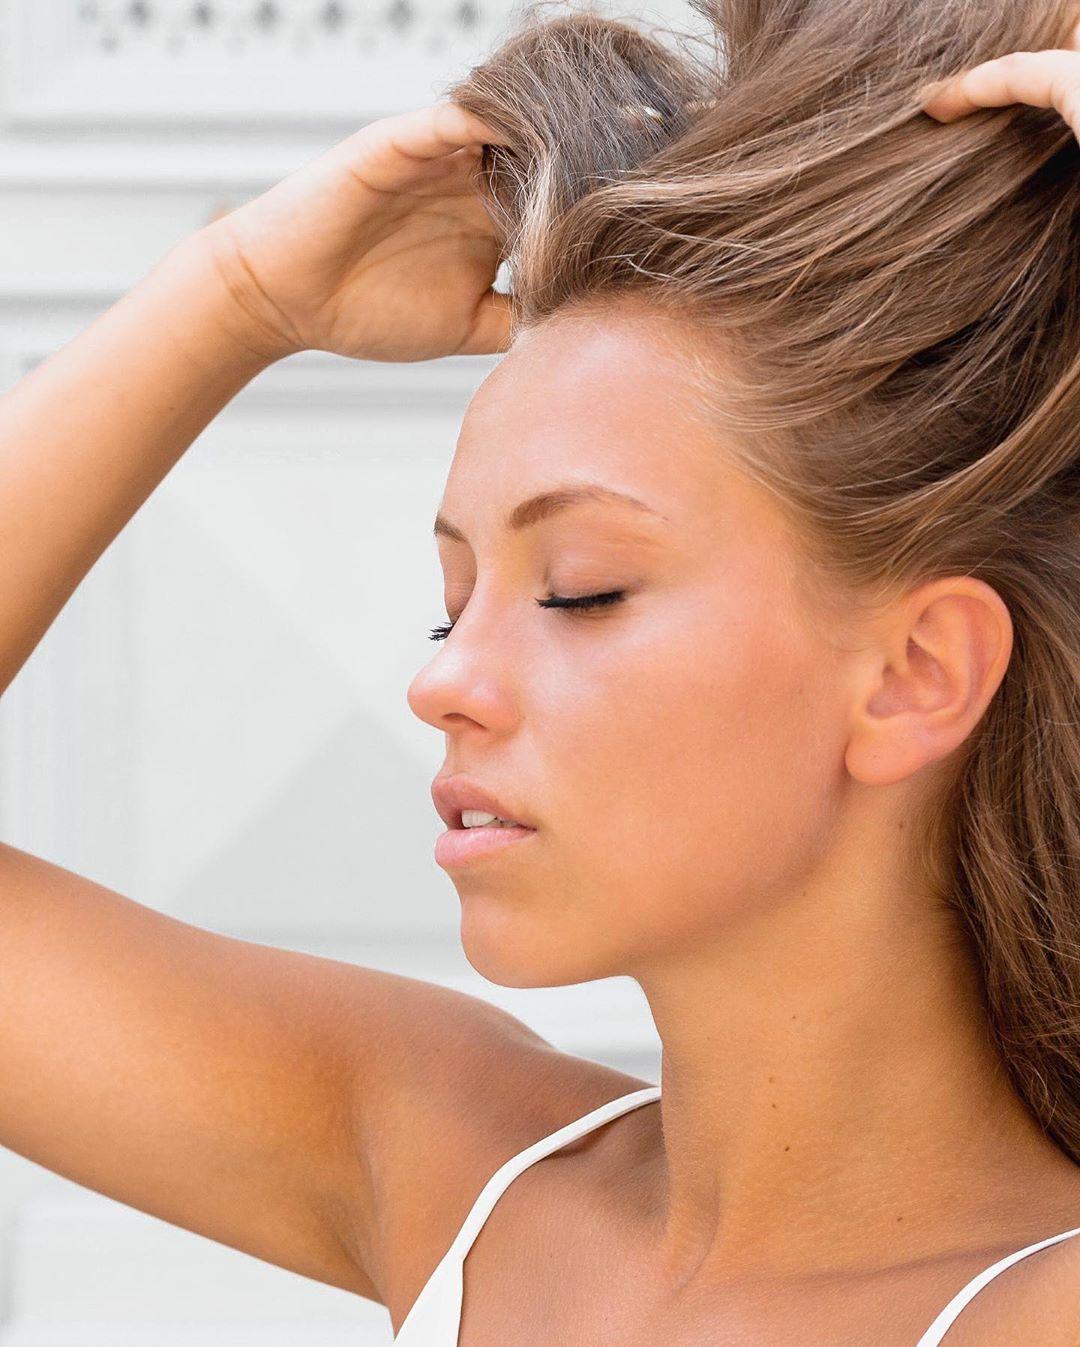 10 Diena Namuose🛋 Gyvenu Savo Mažame Na Staysafe - Natural Makeup